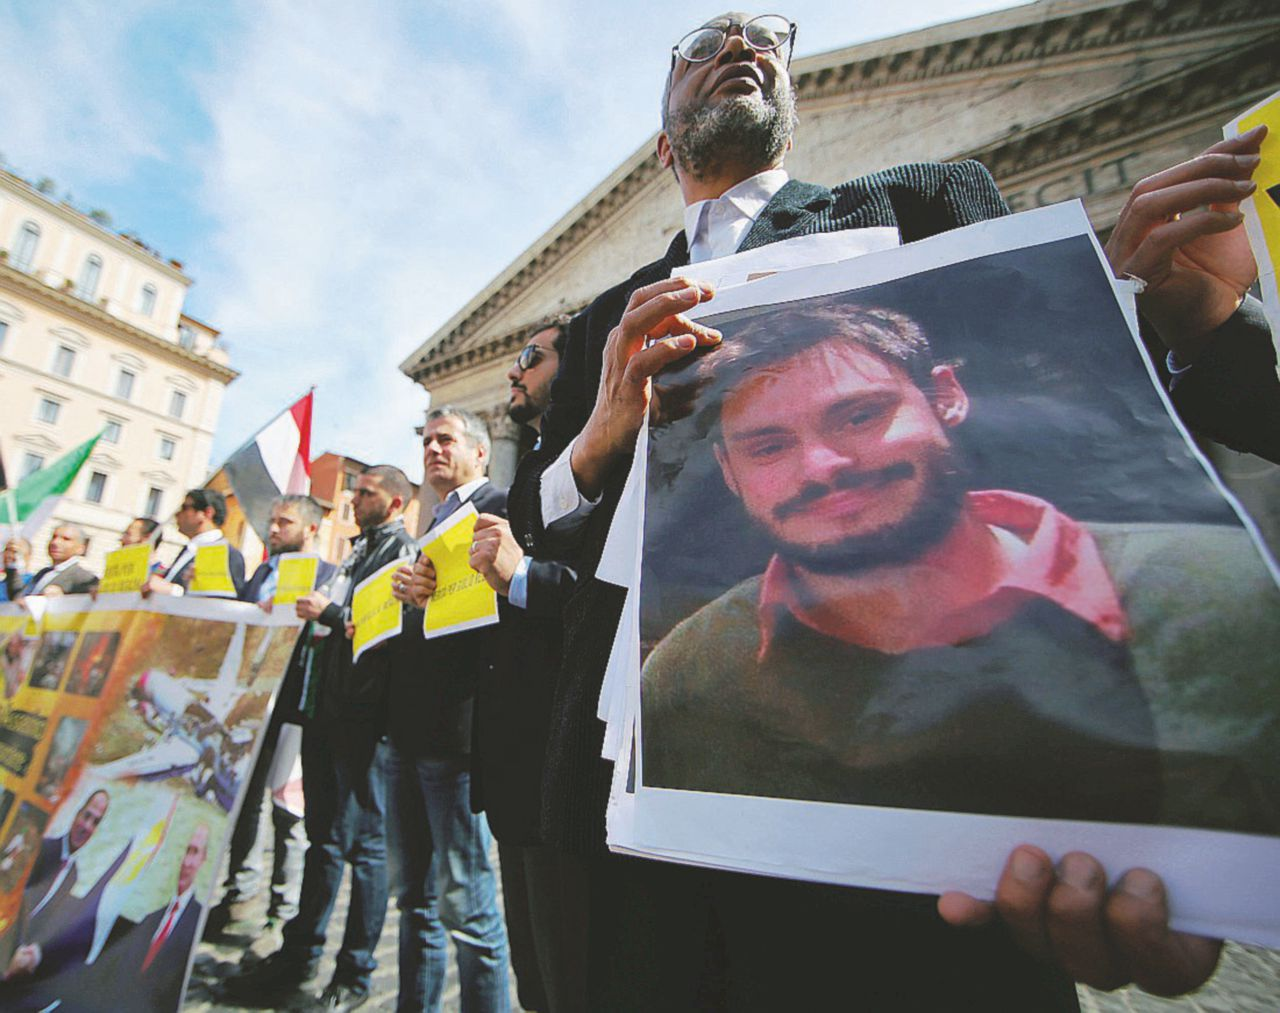 """Regeni sacrificato dal regime dei ricatti. E l'Italia sta zitta"""